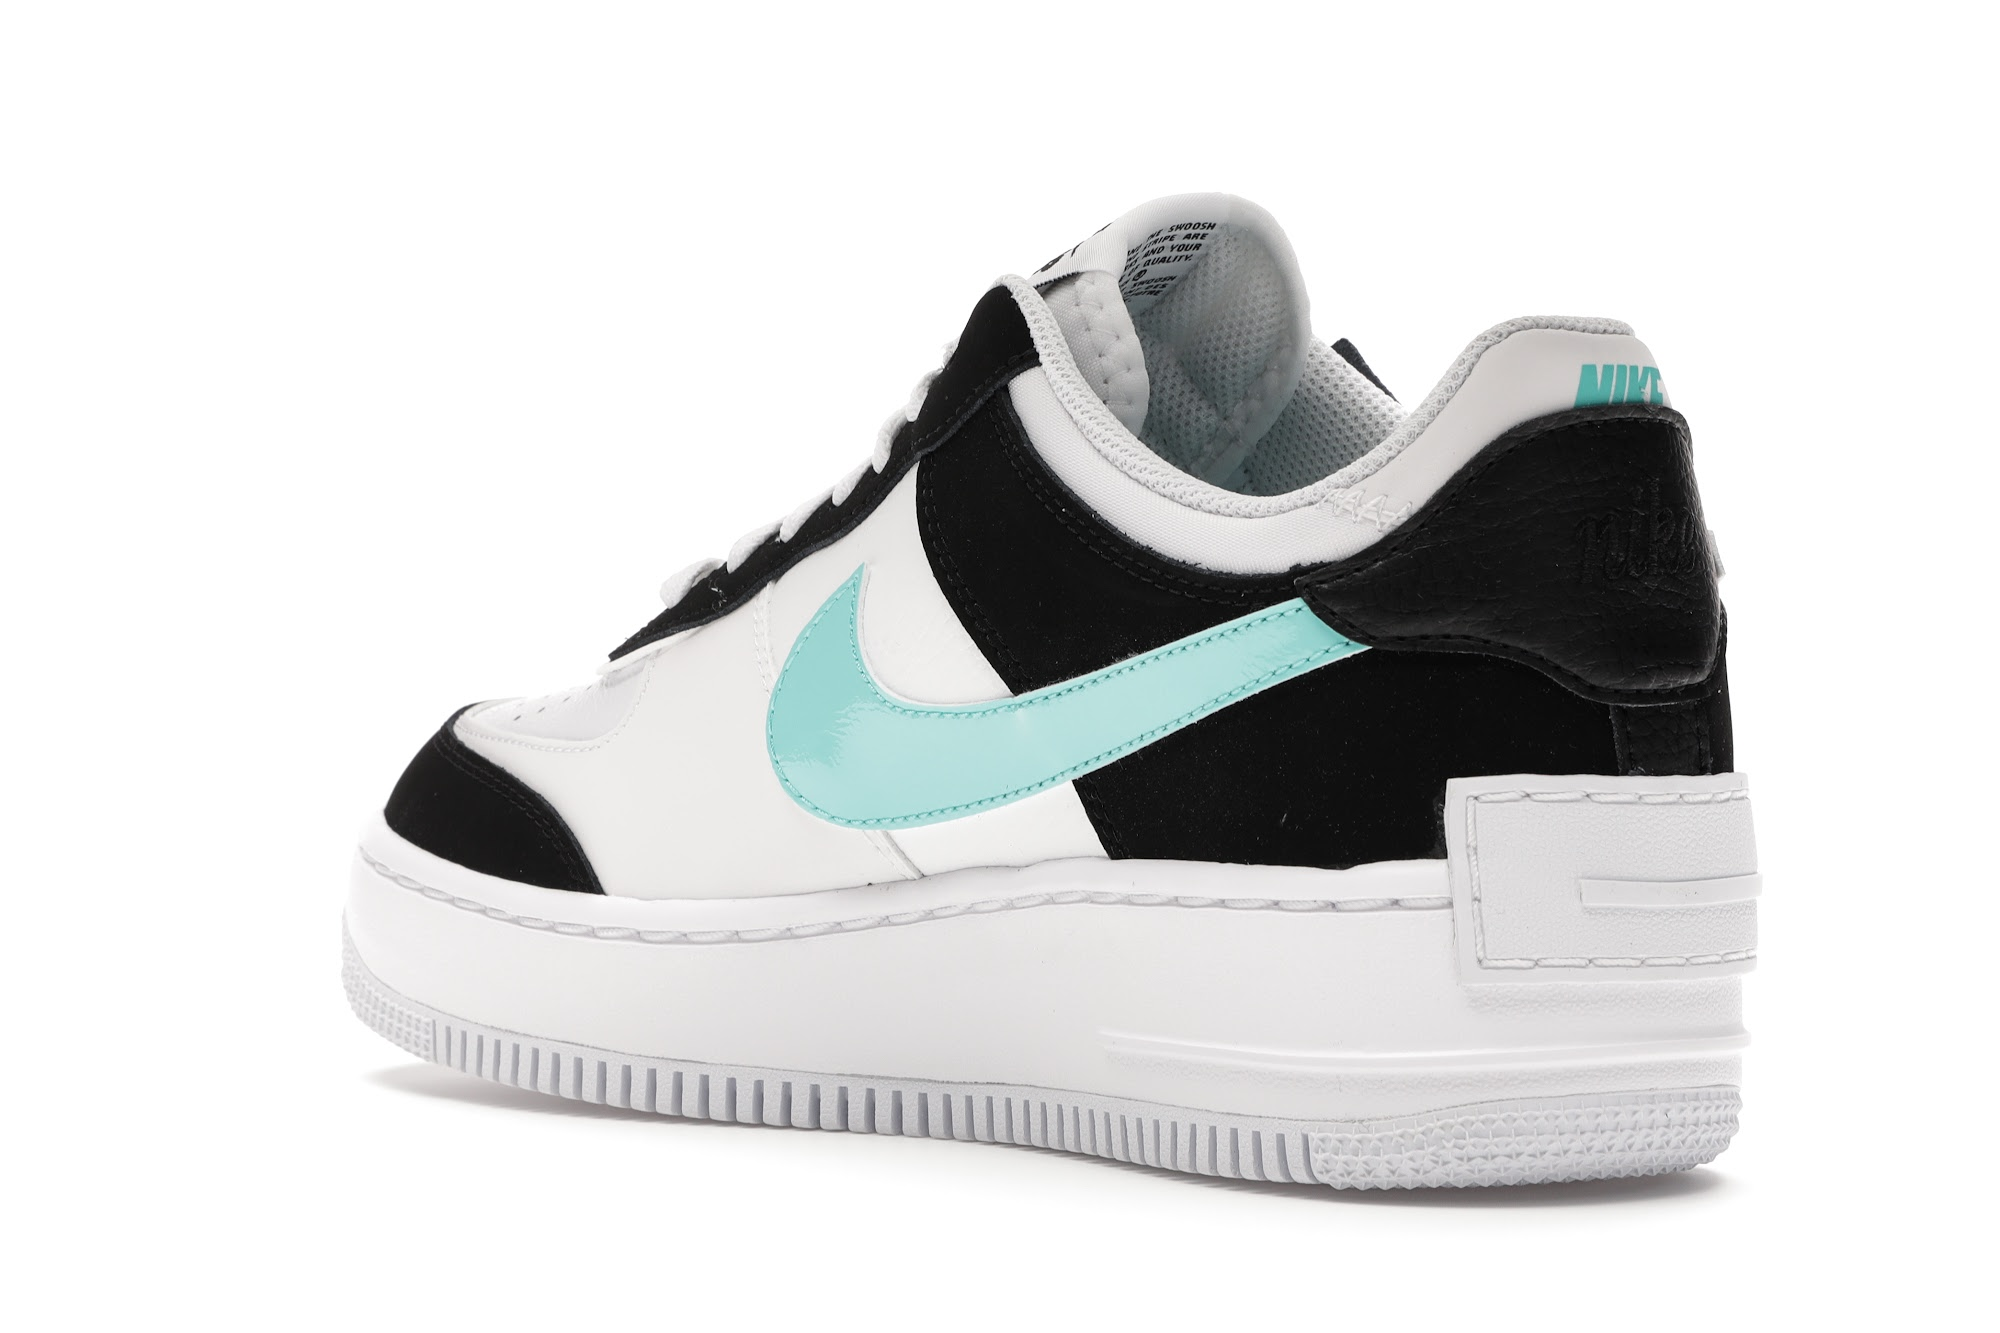 Nike Air Force 1 Shadow White Black Aurora (W) - CZ7929-100